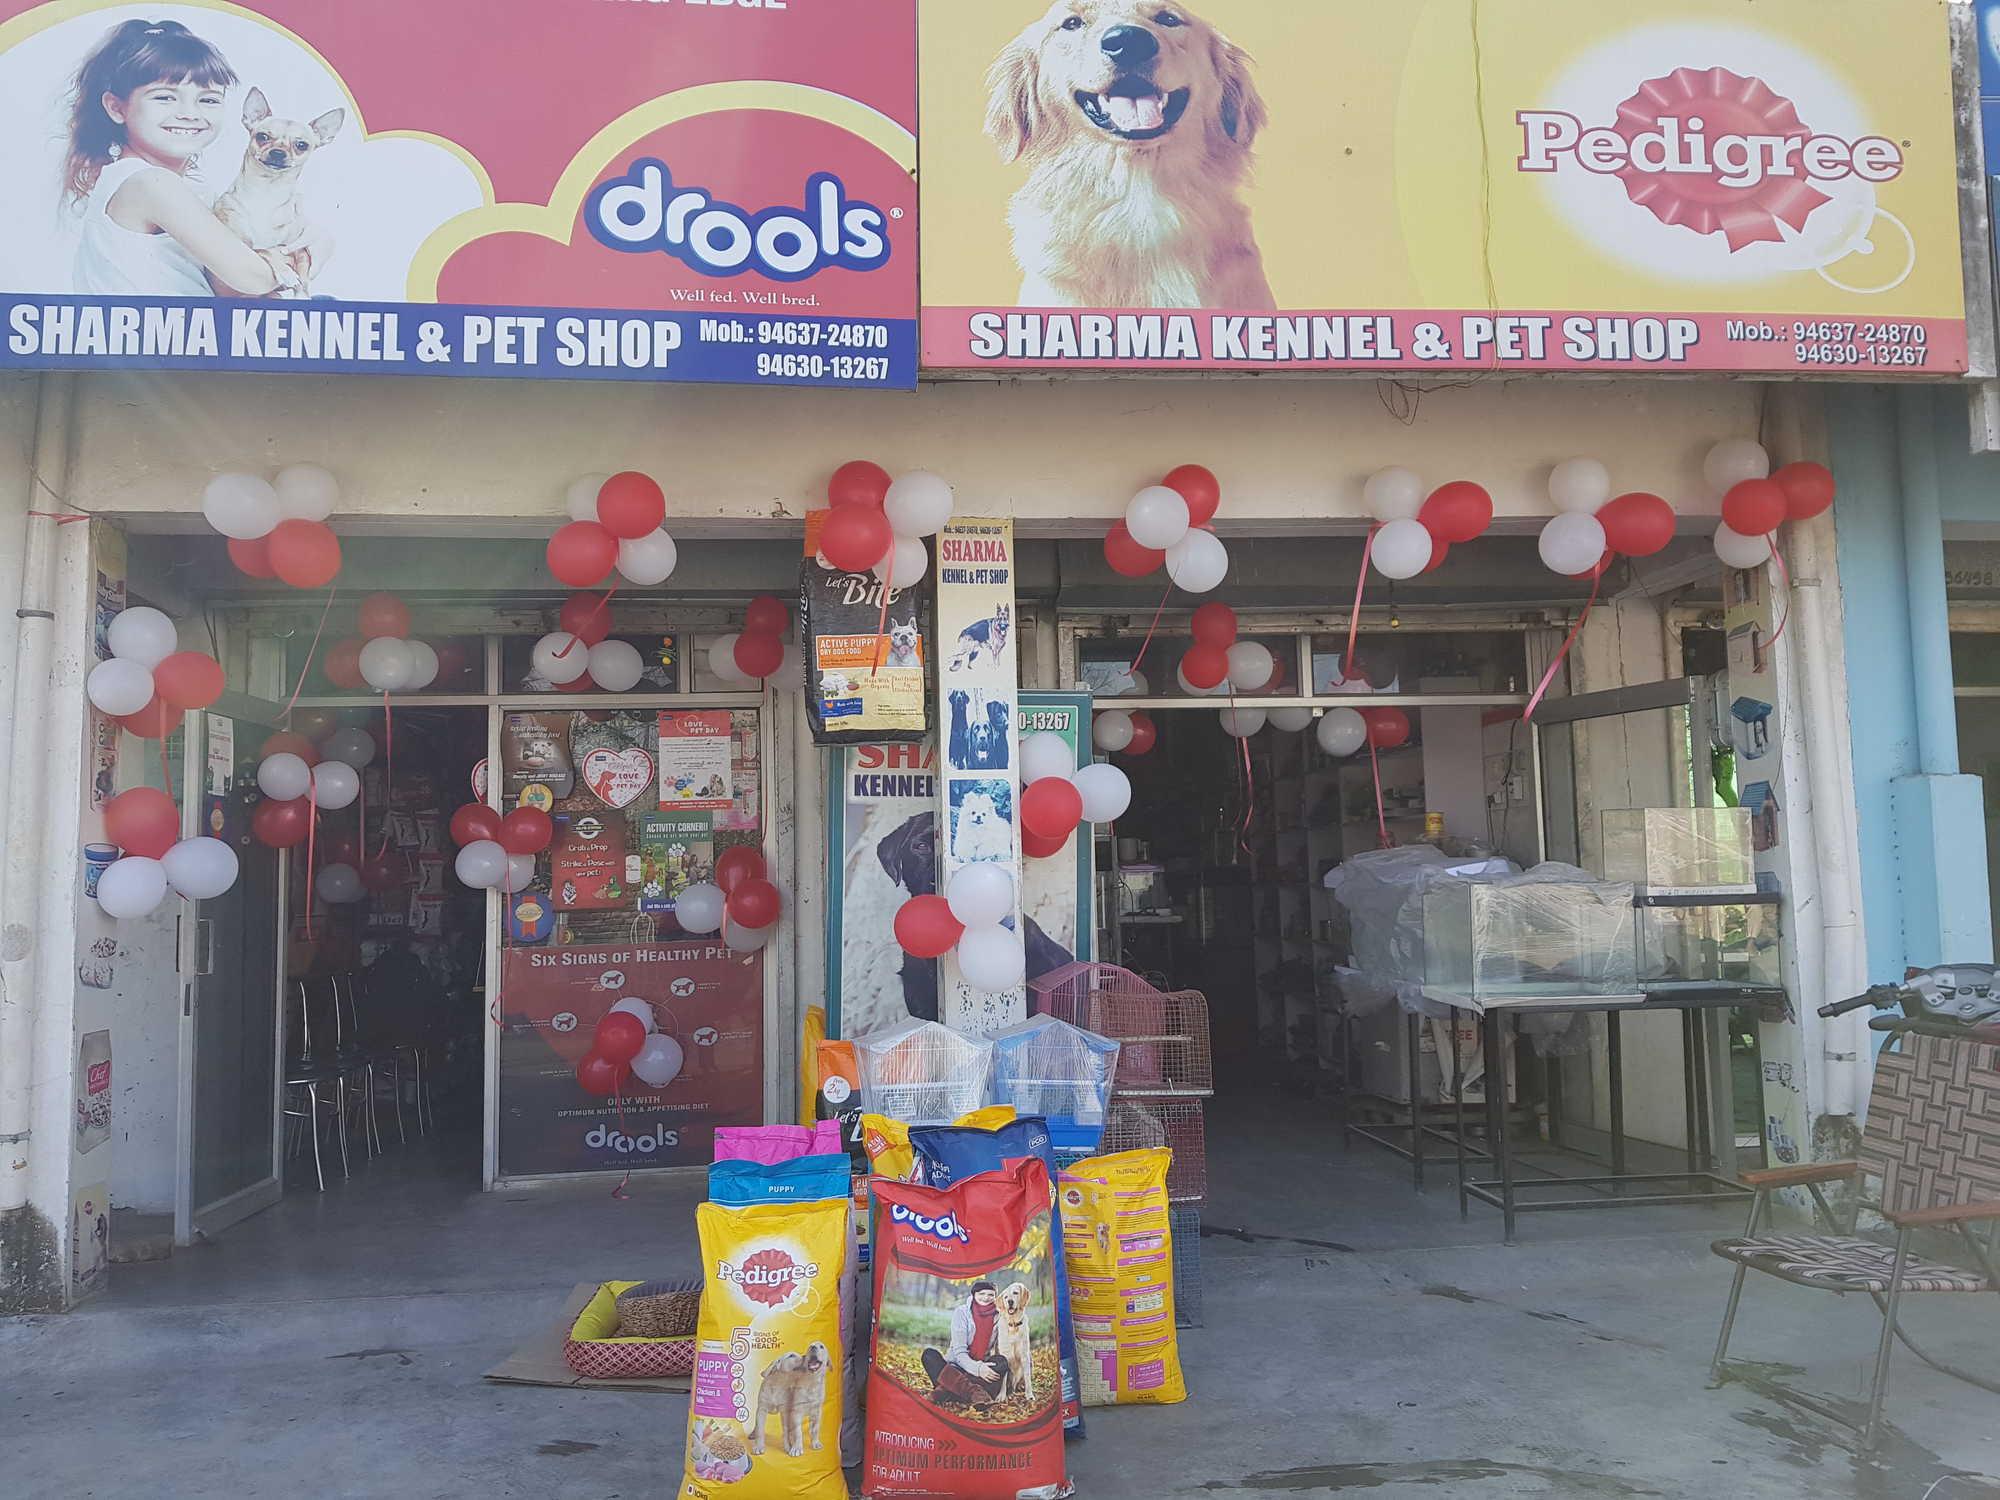 Top Pet Shops For Dog in Hoshiarpur - Best Pet Store - Justdial